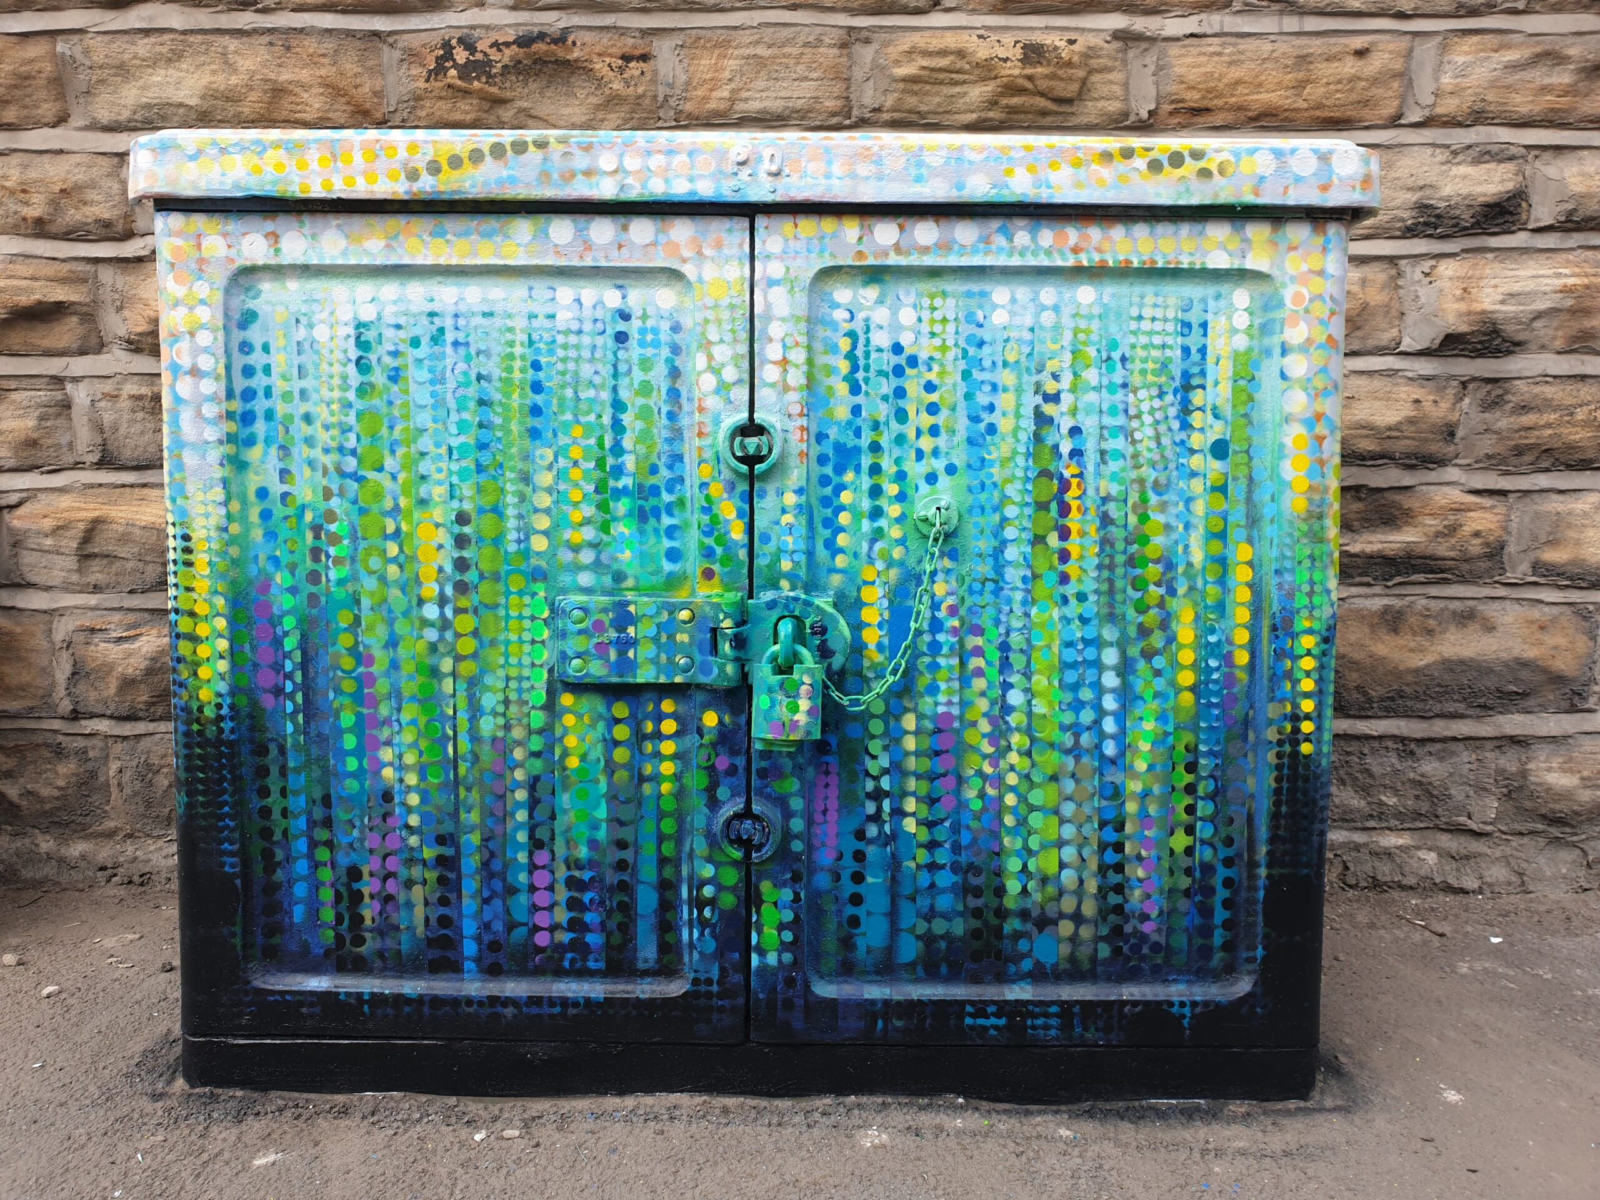 Kelham Weir - telecoms box painted by Kieran Flynn